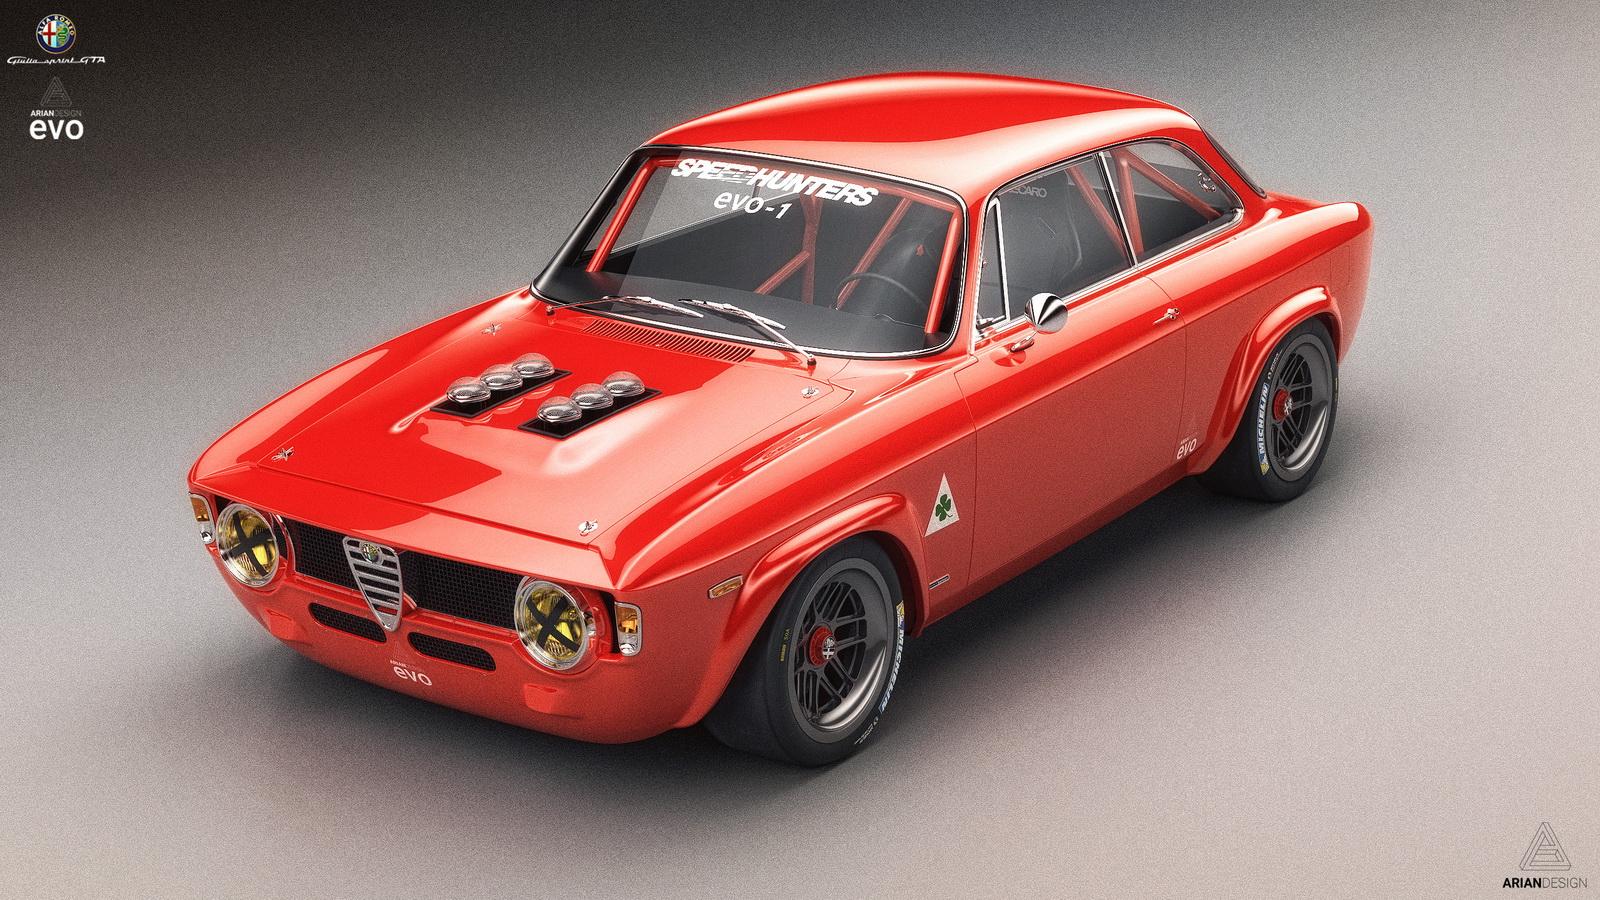 Uber Black Driver >> This Classic Alfa Romeo Giulia GTA Looks So Yummy, We Wish ...